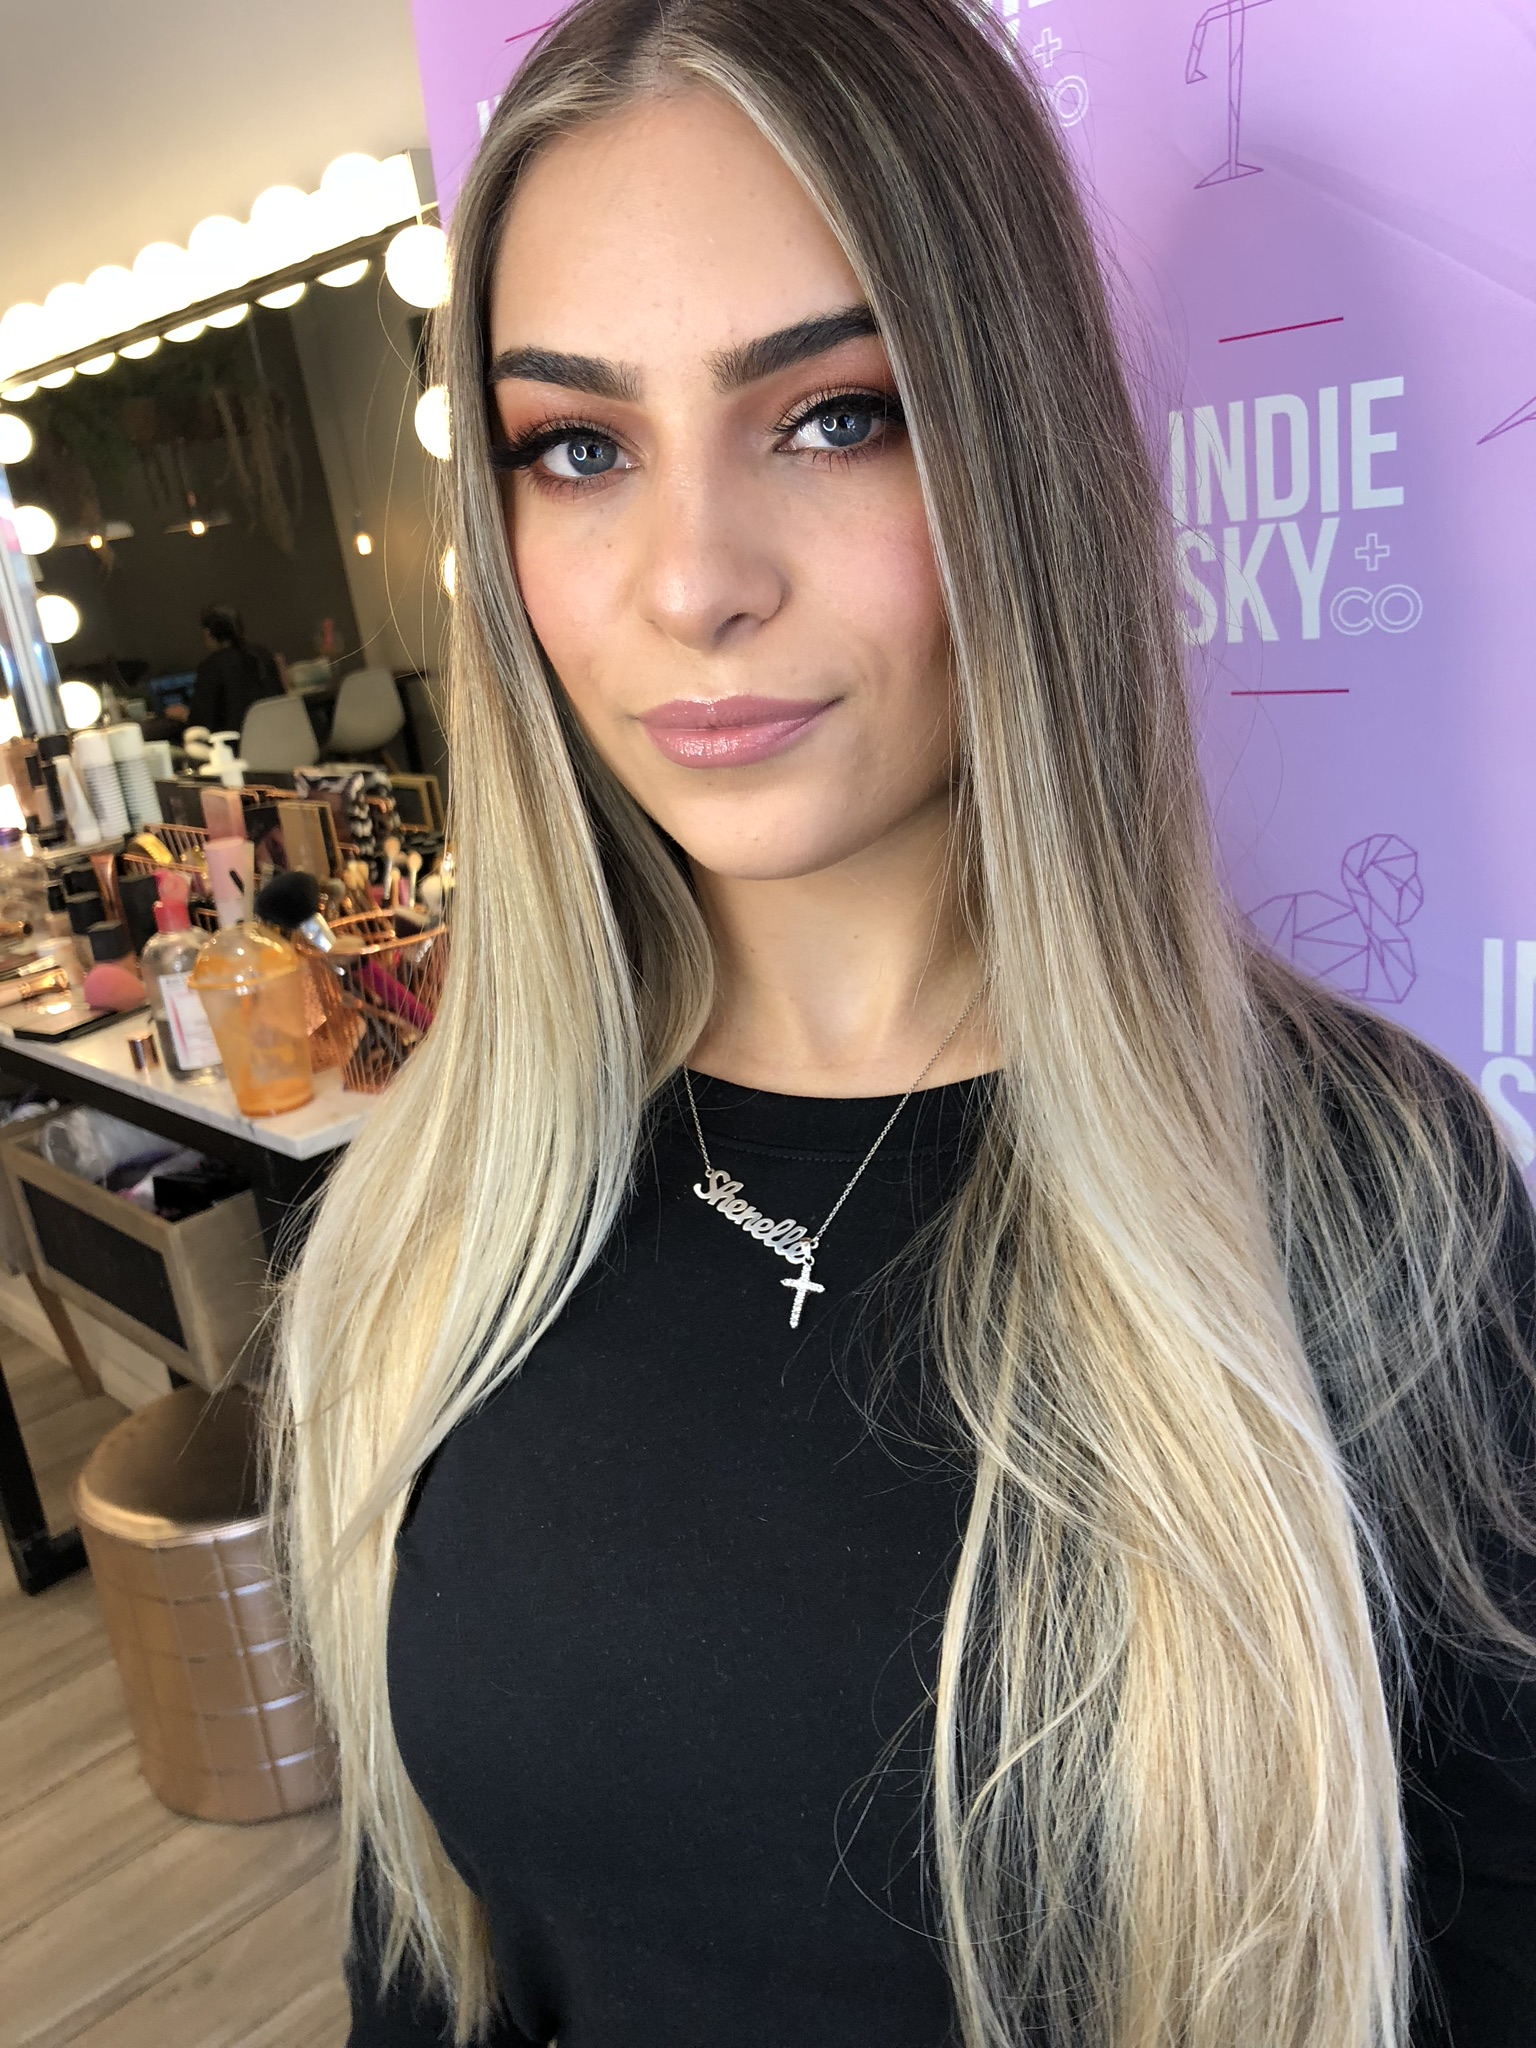 Indie Sky and Co Drummoyne Hairdresser 20.JPEG